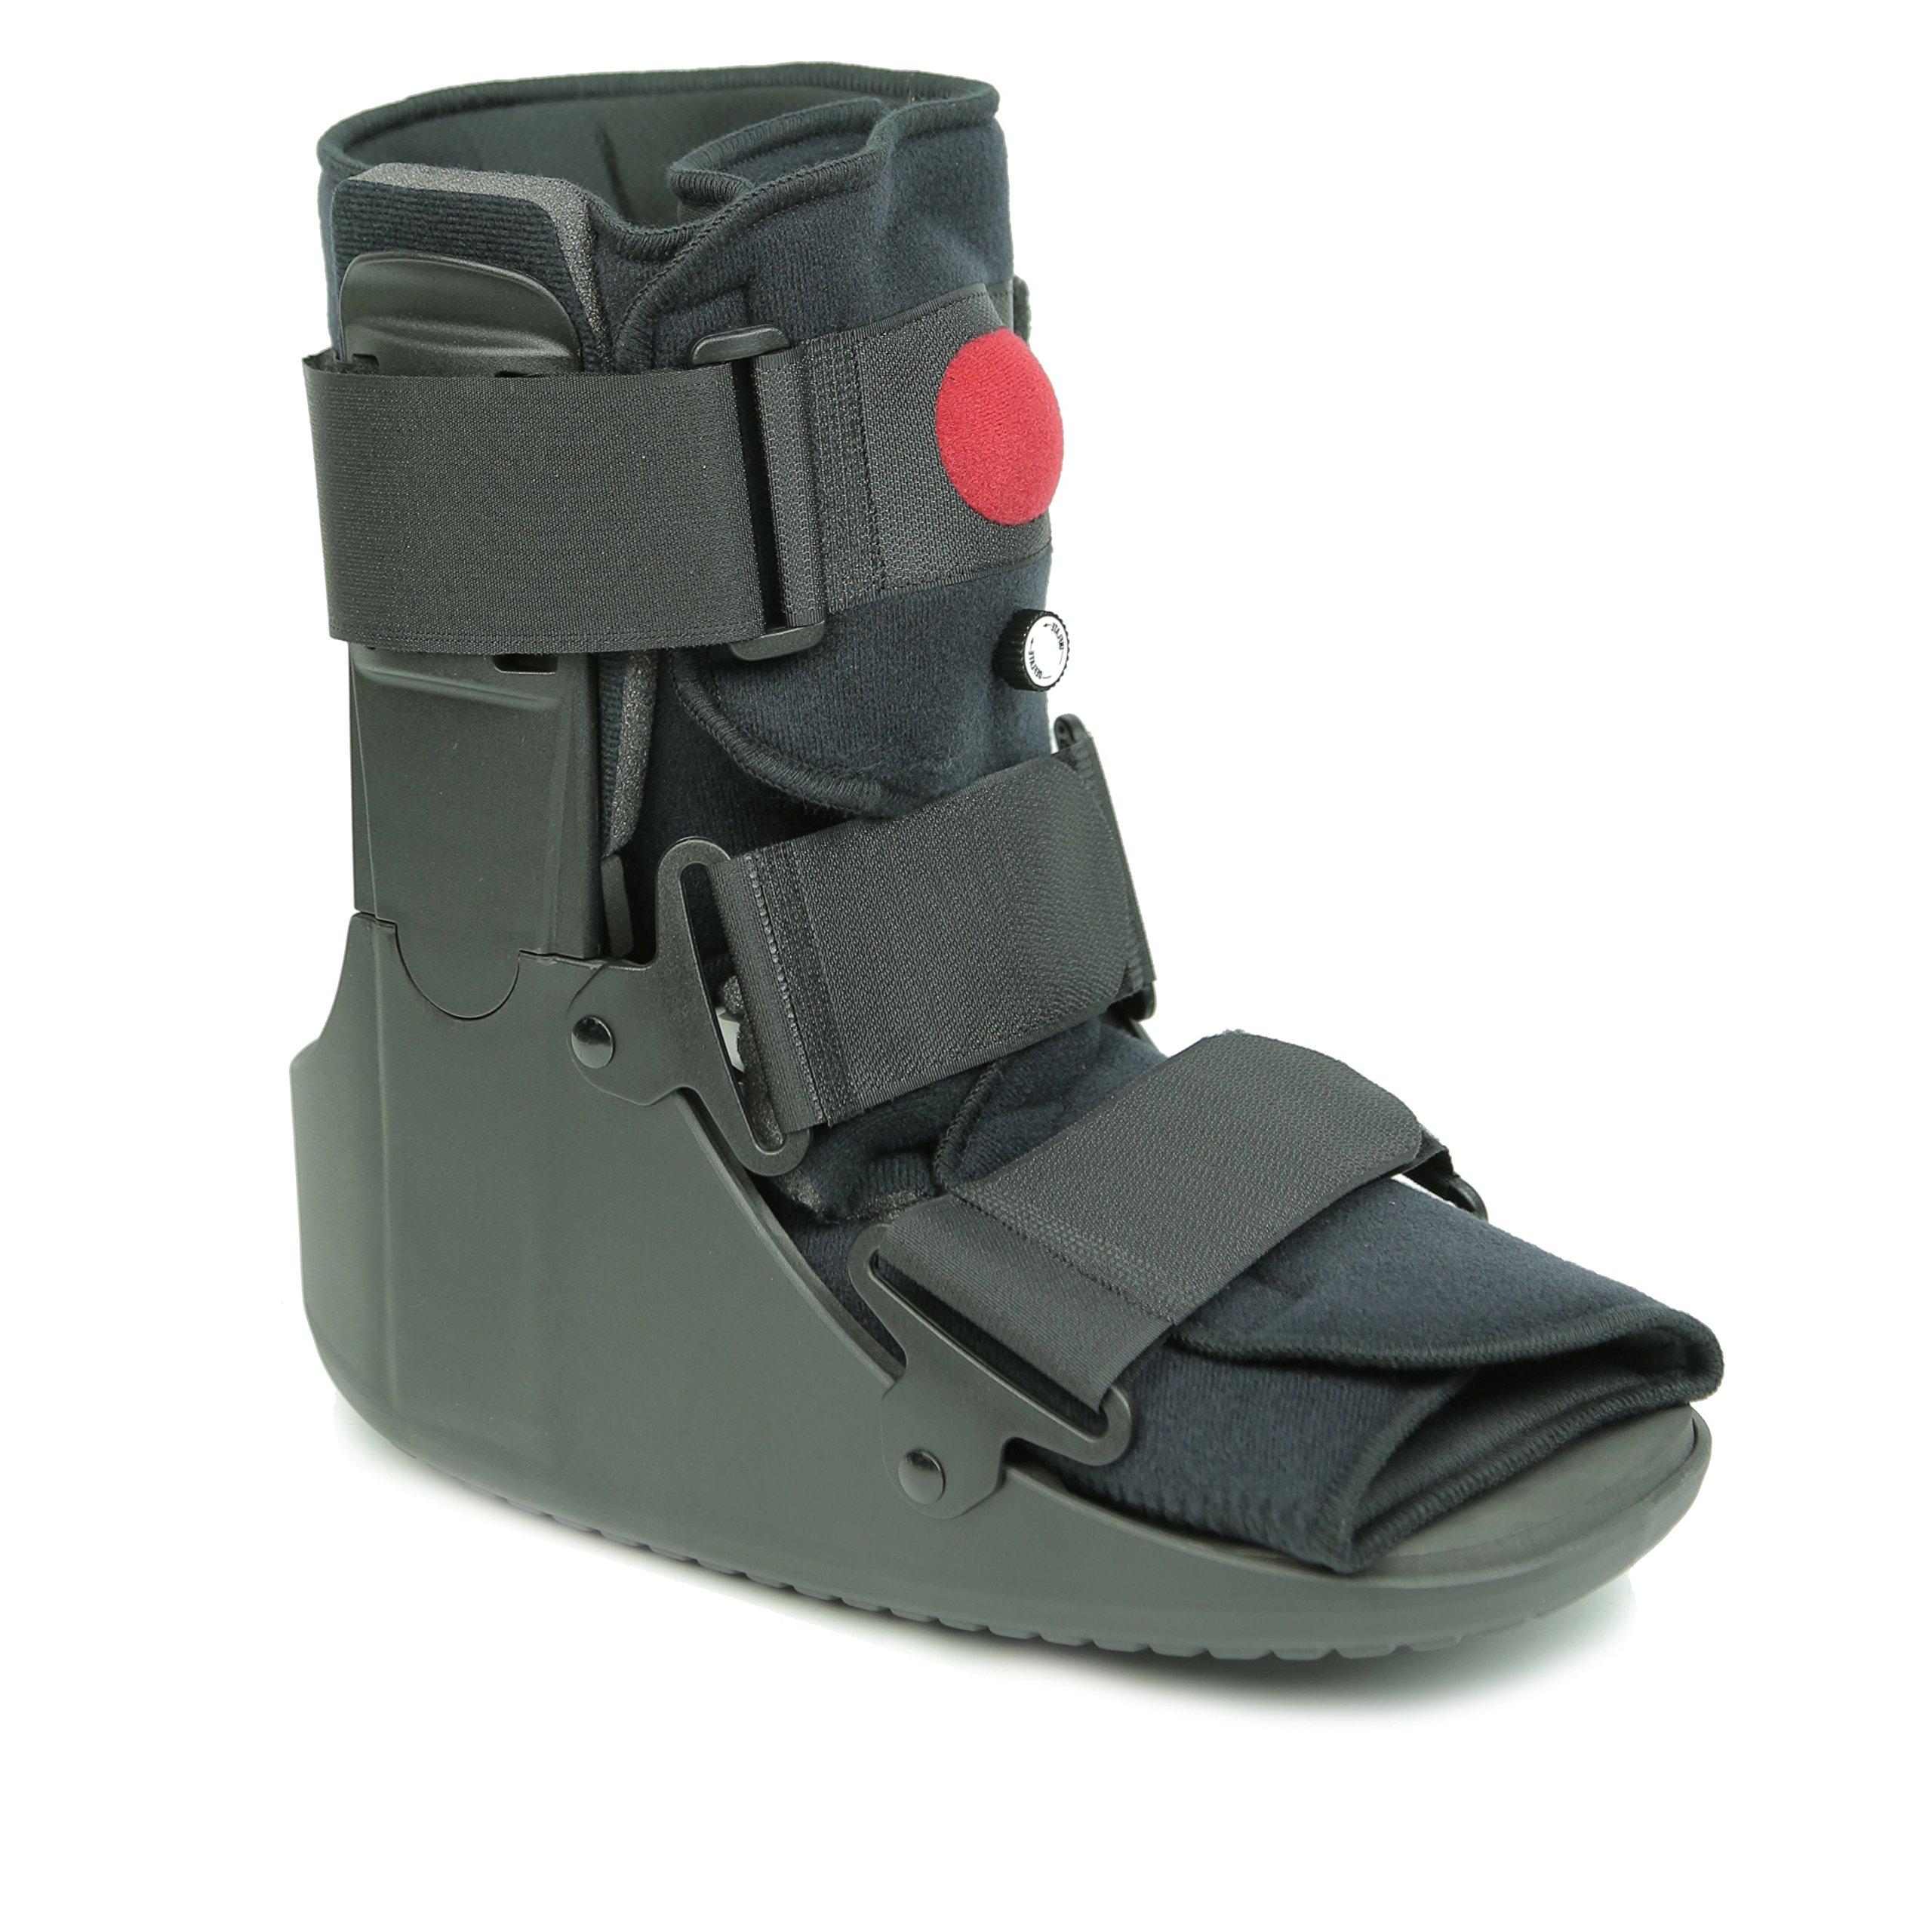 Mars Wellness Premium Short Air Cam Walker Fracture Ankle / Foot Stabilizer Boot - Medium